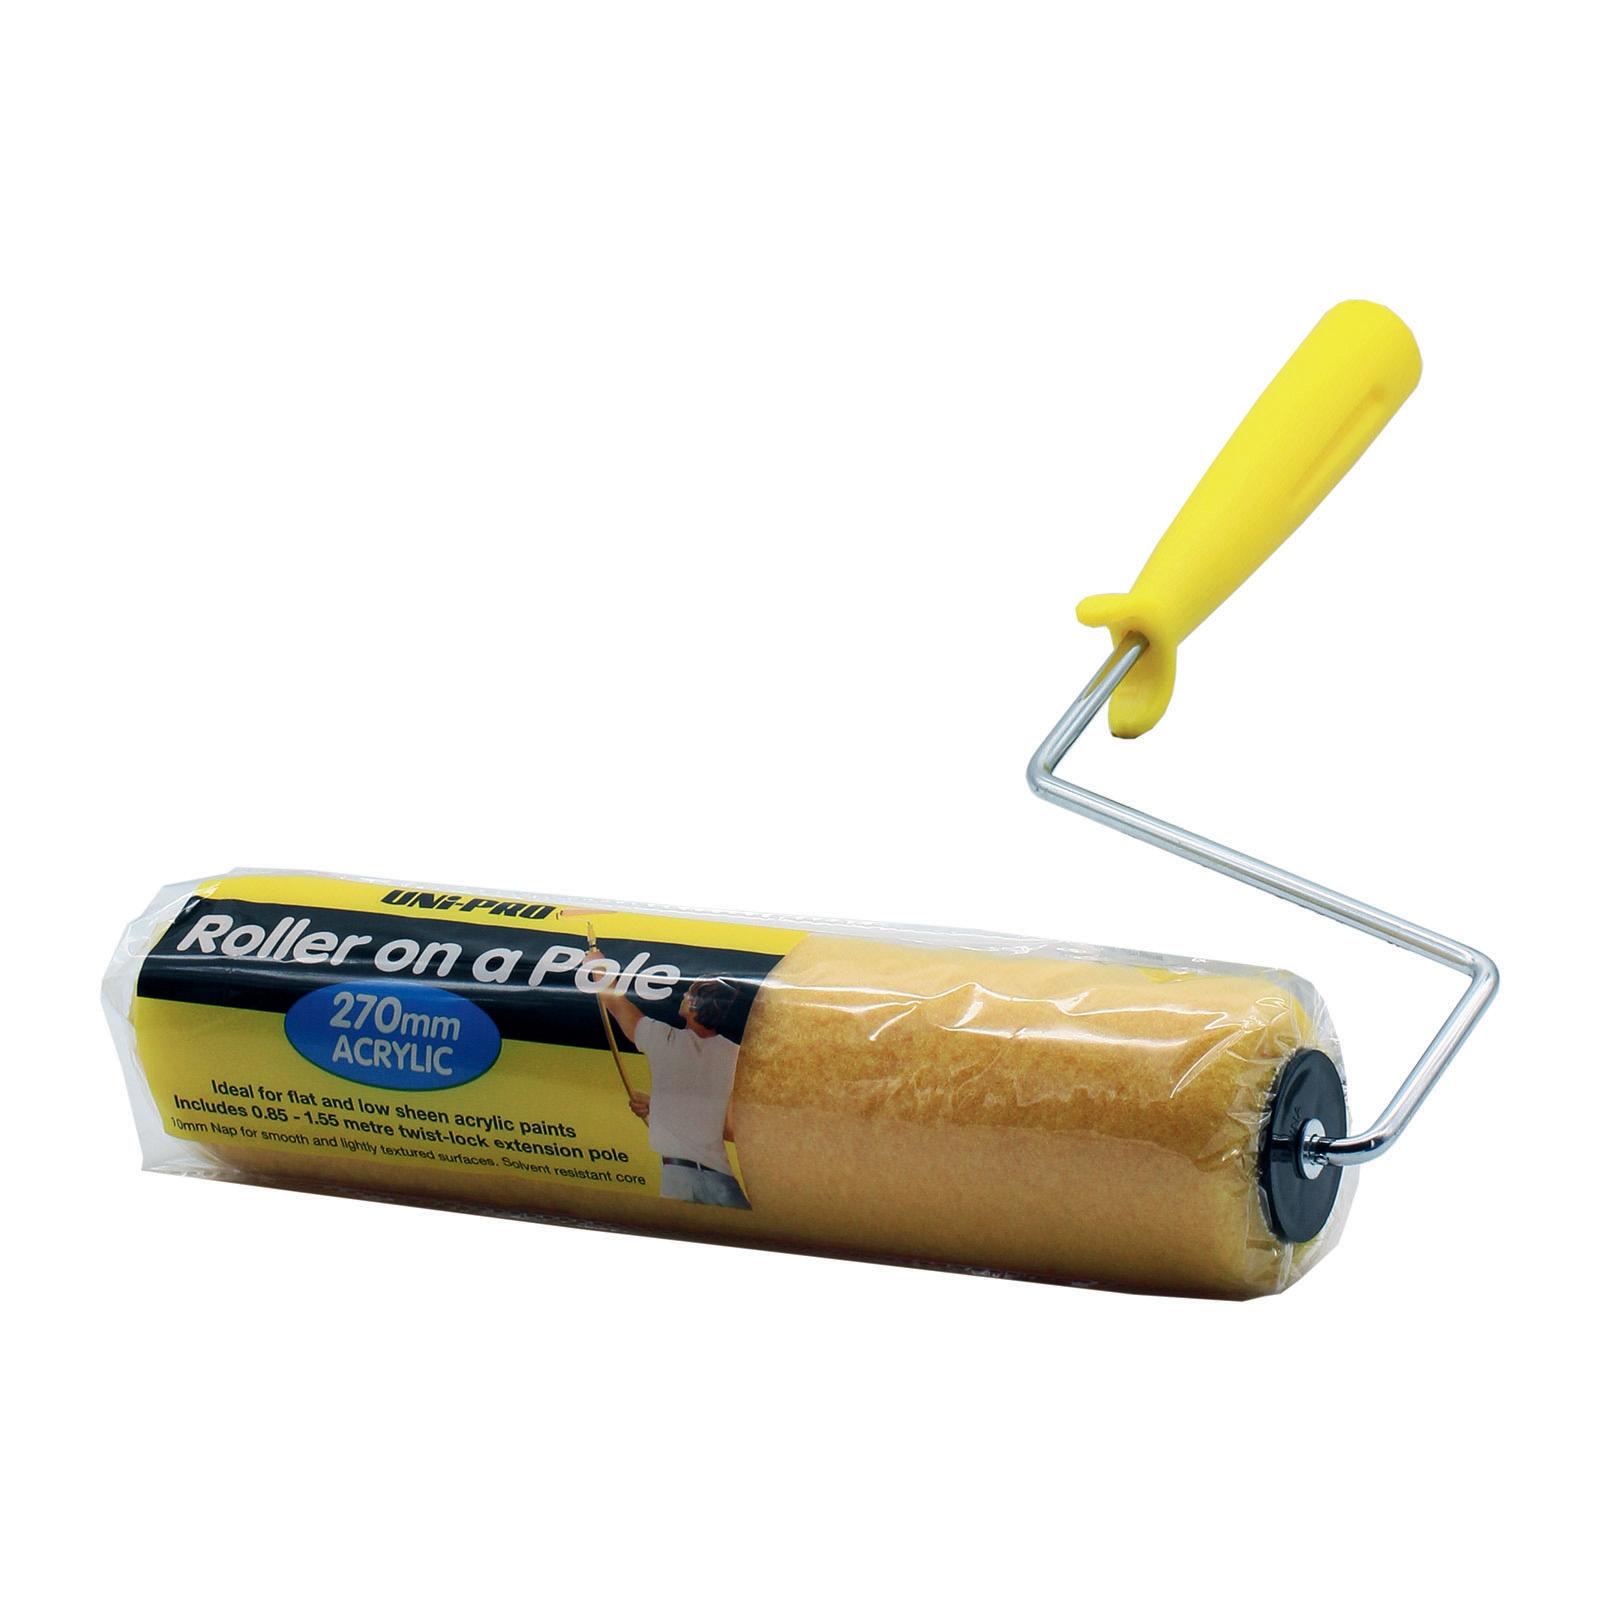 UNi-PRO 270mm Roller on a Pole DIY